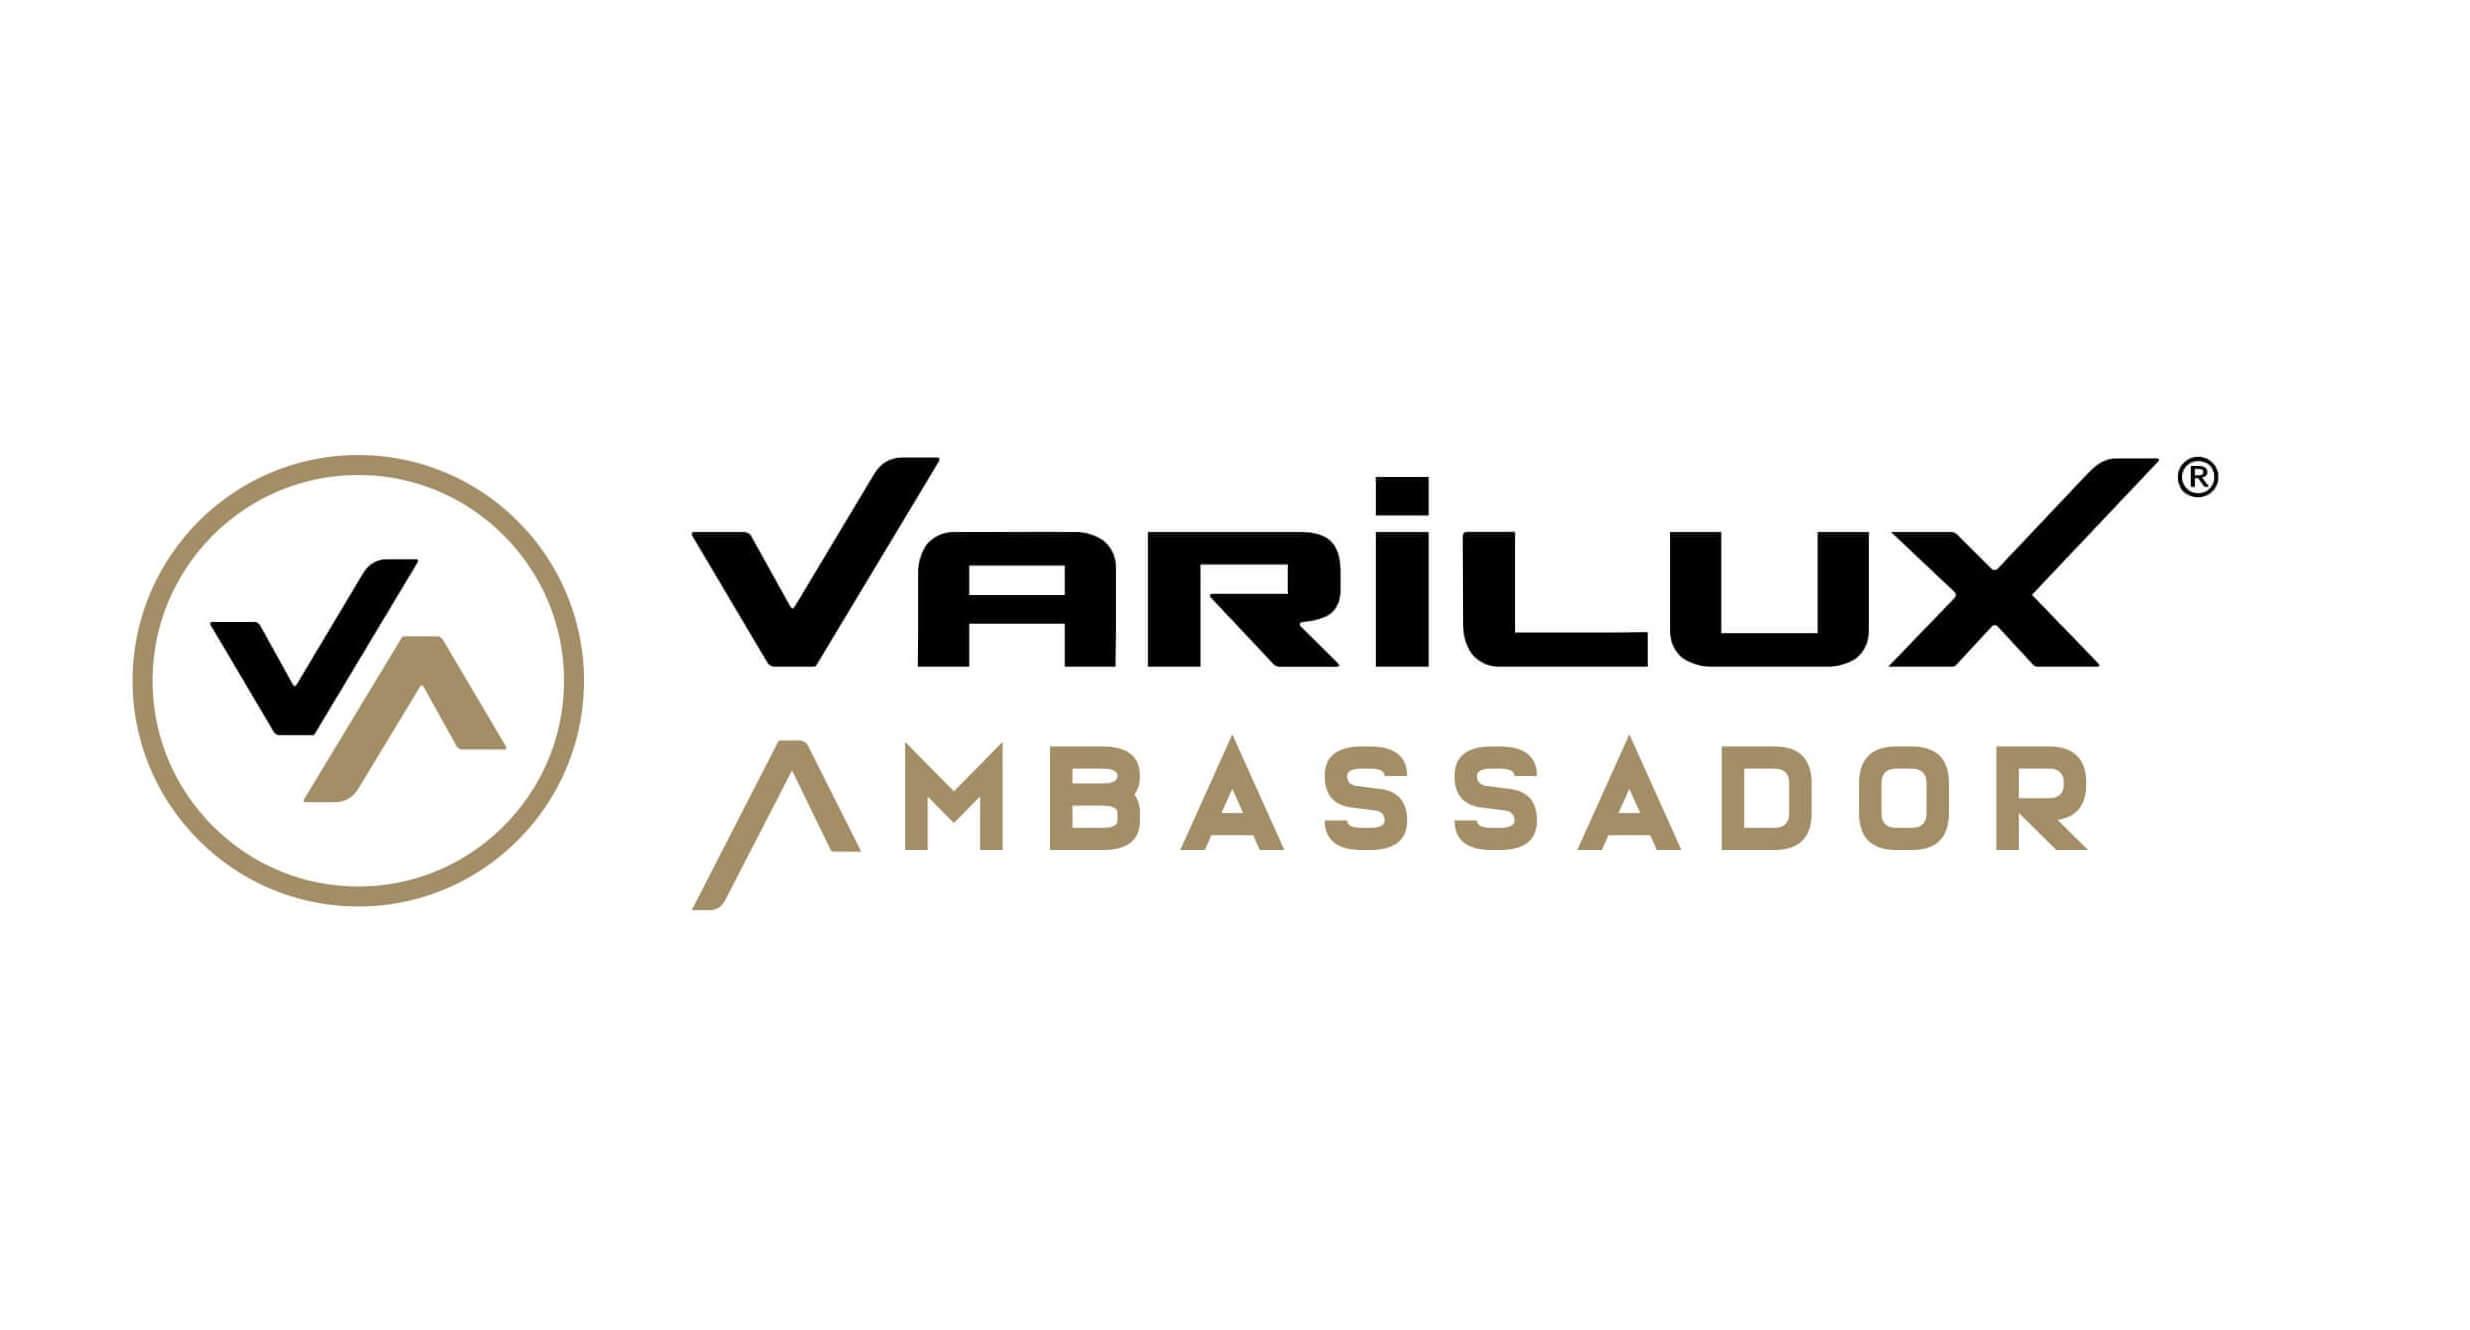 Varilux ambassador